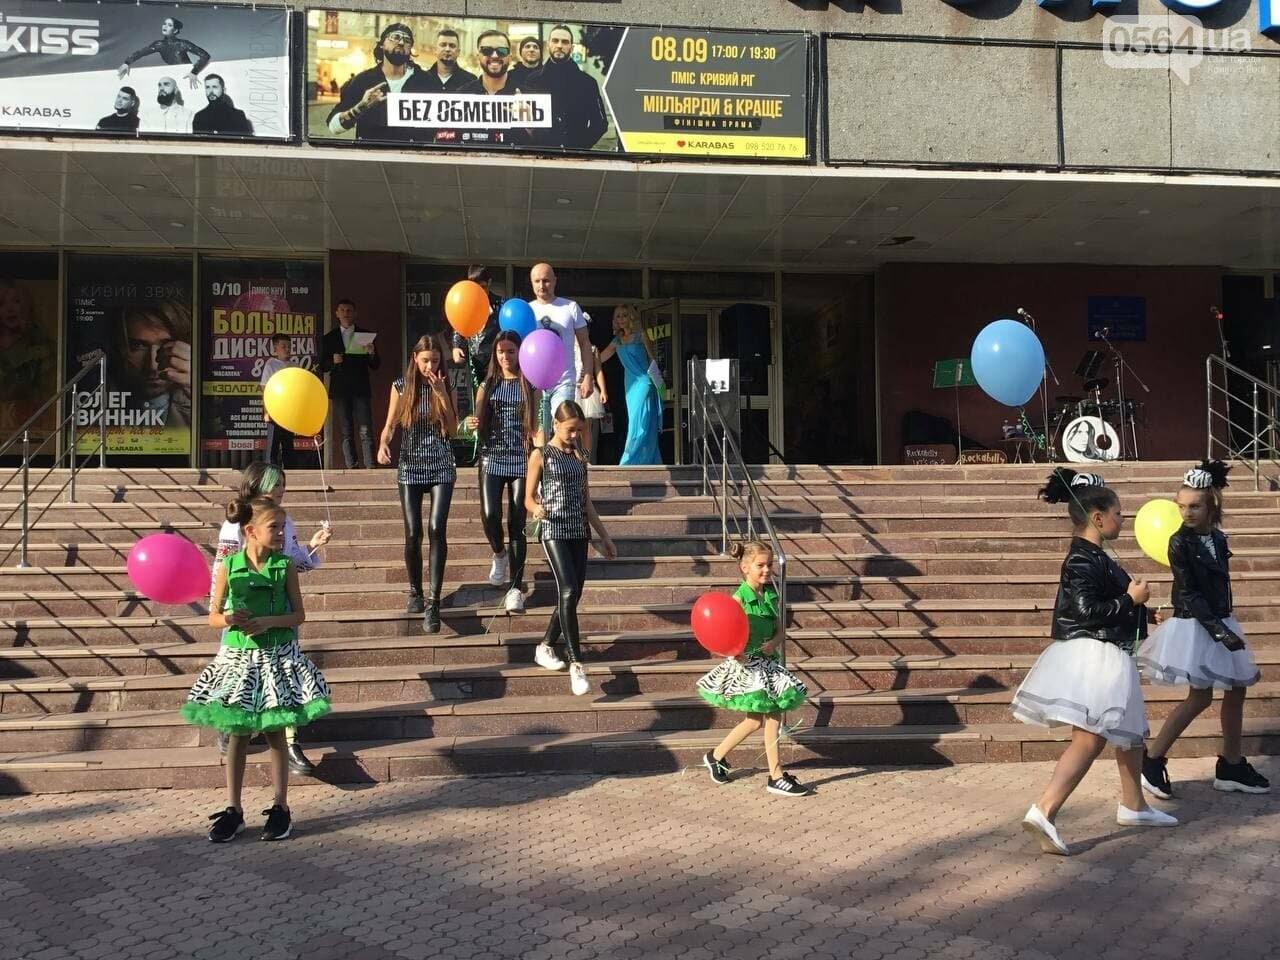 18 конкурсантов представили своё творчество на 5-м Криворожском фестивале имени Кузьмы Скрябина, - ФОТО, ВИДЕО, фото-8